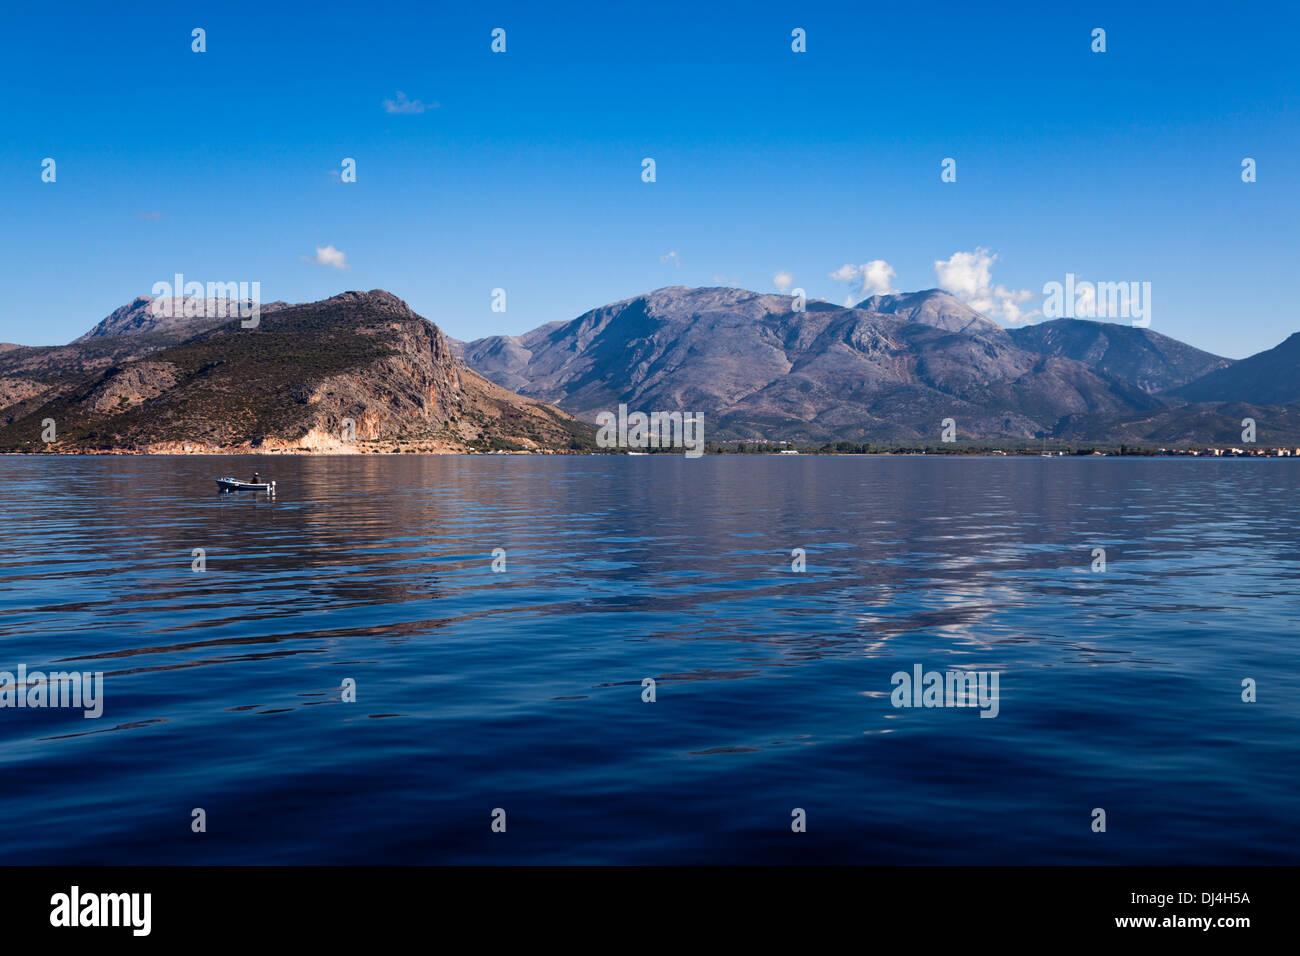 Fishing off the Greek Coast near to Mitikas in the Ionian Sea - Stock Image